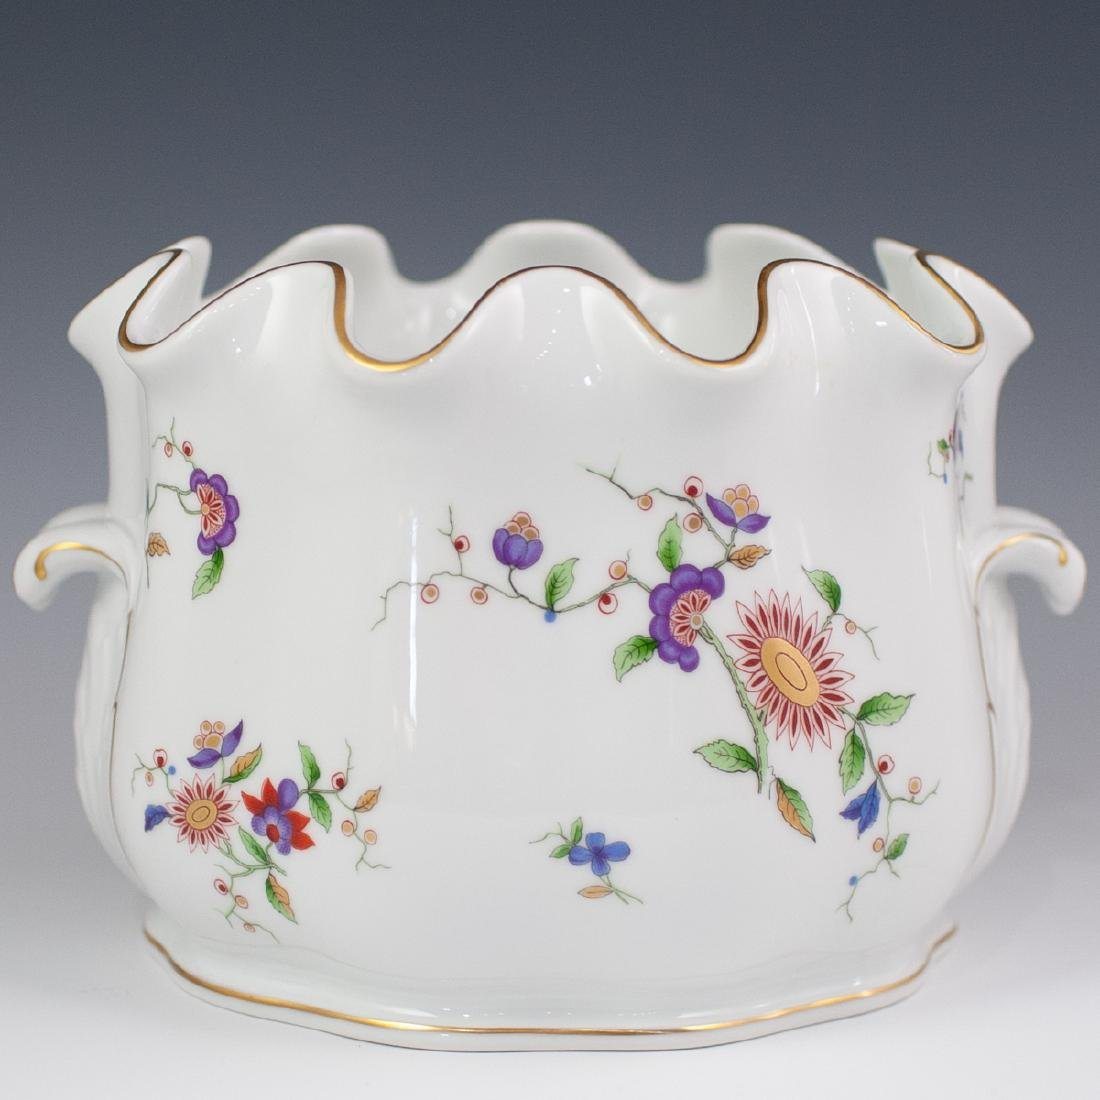 Richard Ginori Porcelain Cache Pot